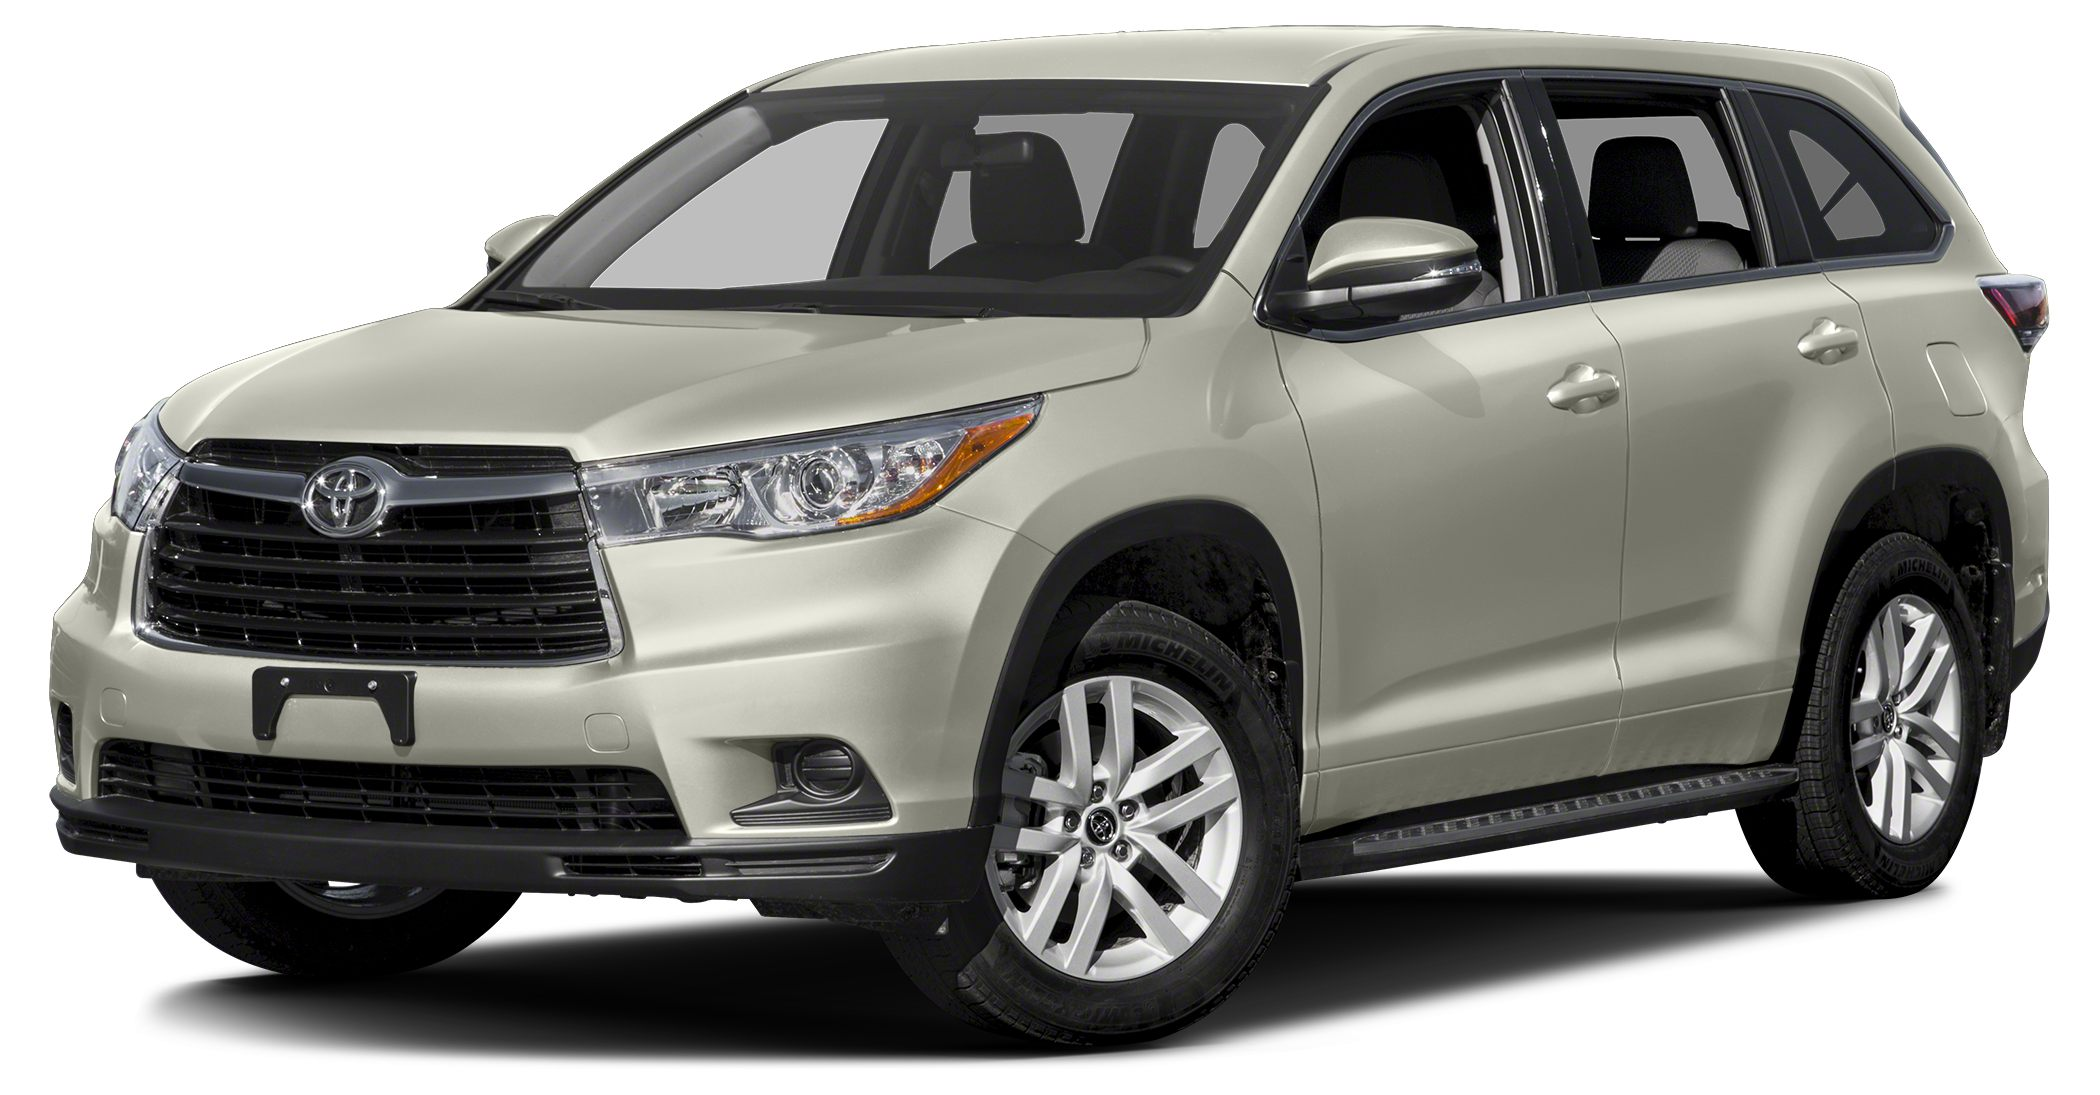 2016 Toyota Highlander LE Plus Miles 0Color Blizzard Pearl Stock 49131 VIN 5TDZKRFH9GS149131